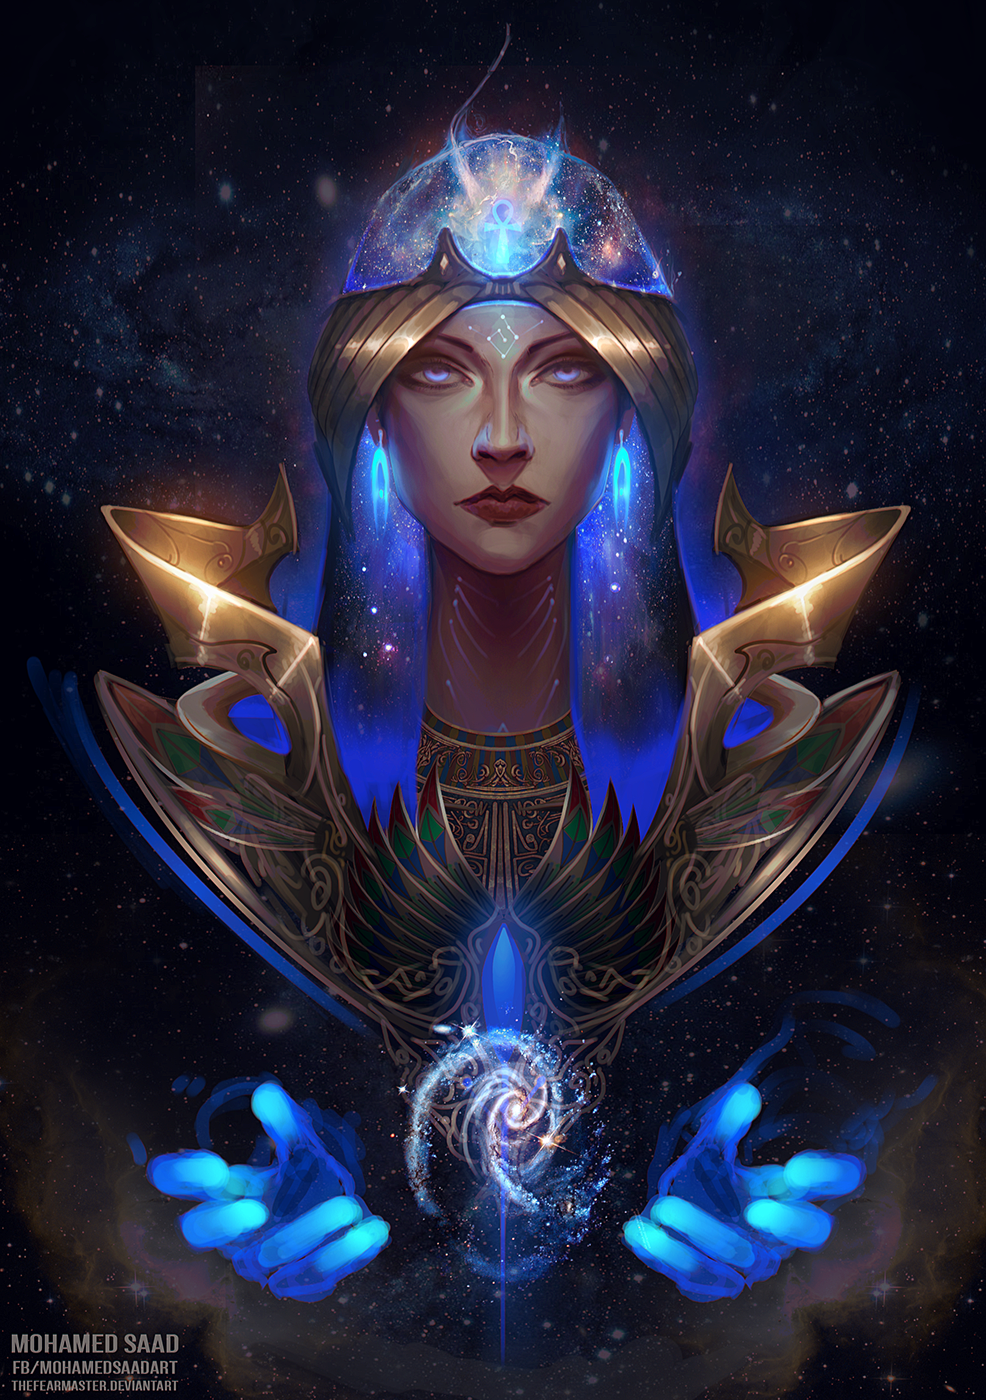 Nut - Goddess of the sky